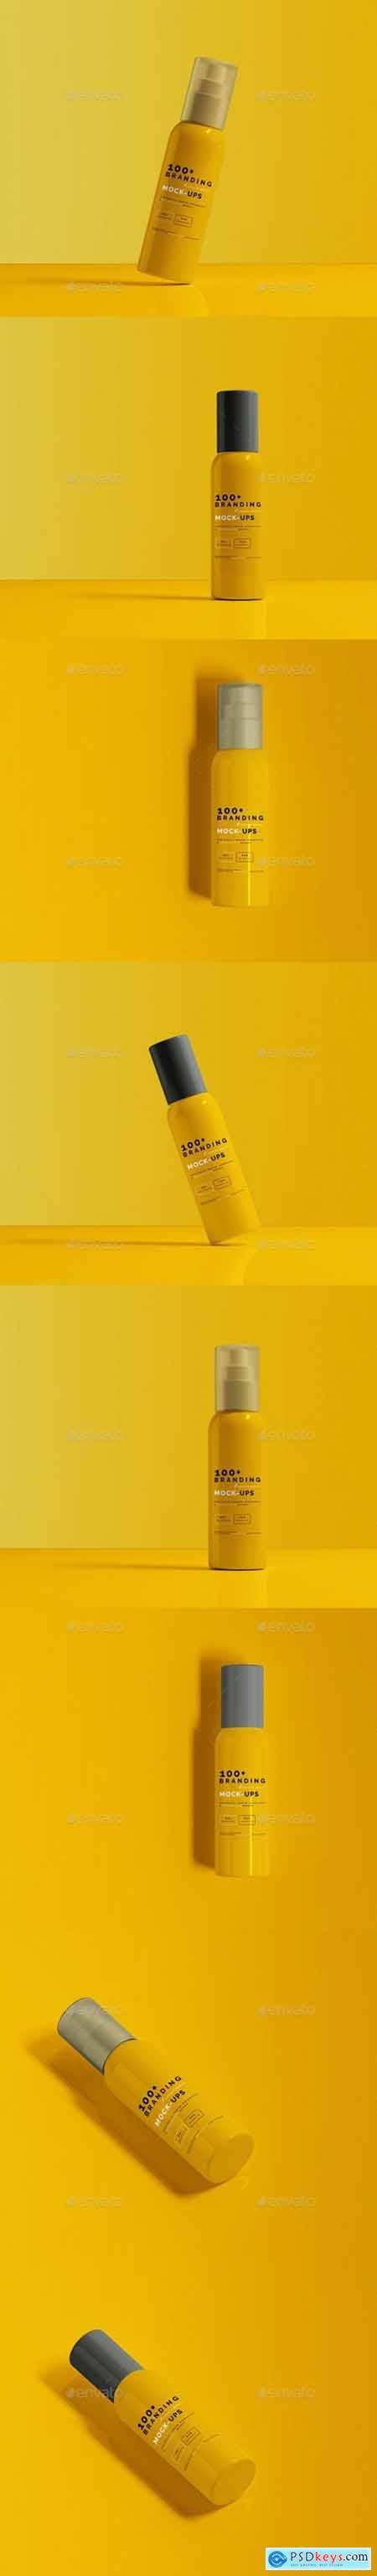 Spray Bottle Mockup 29716675